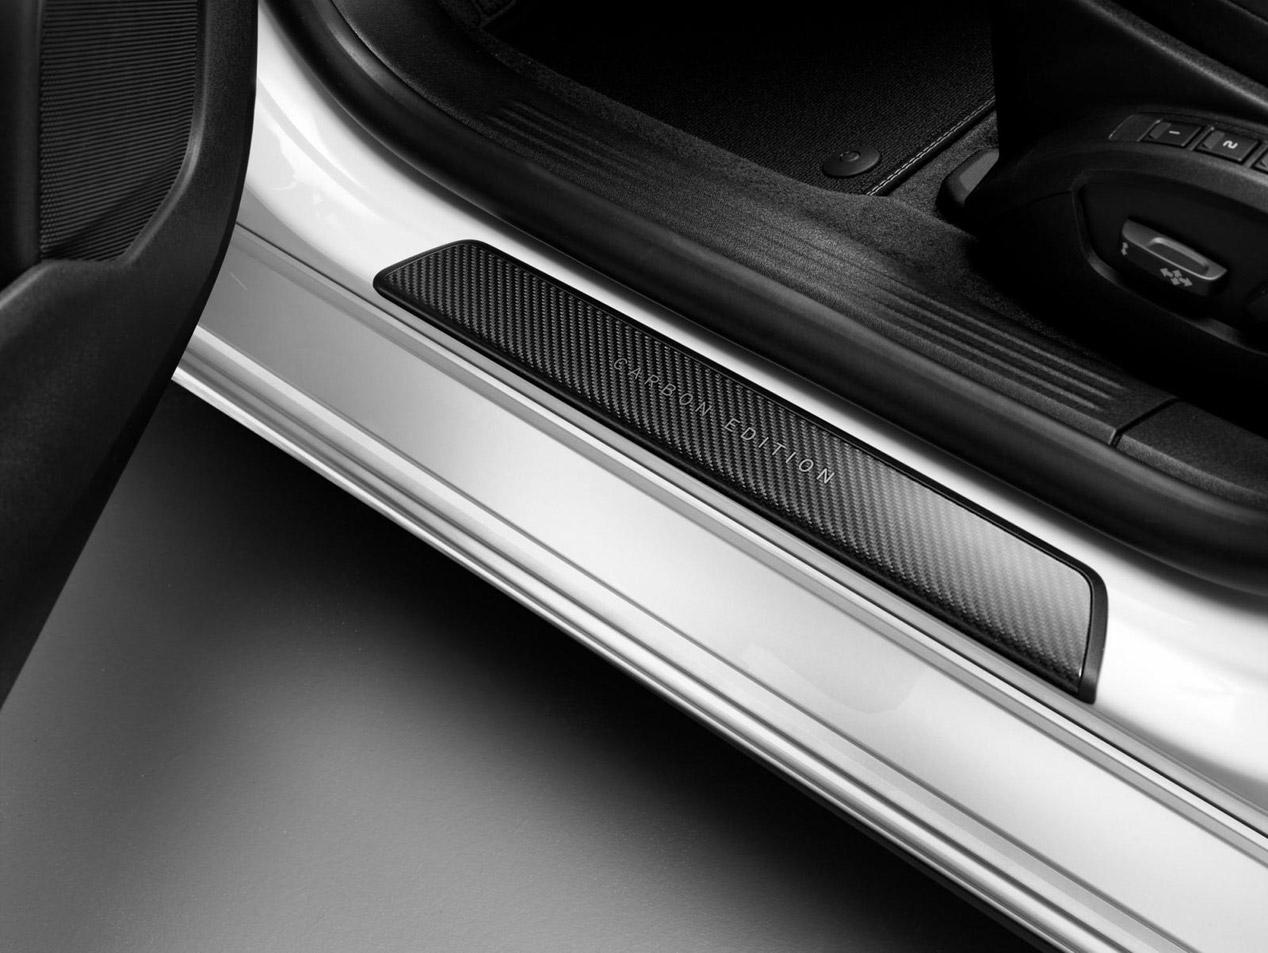 Volvo V40 Carbon Edition 2